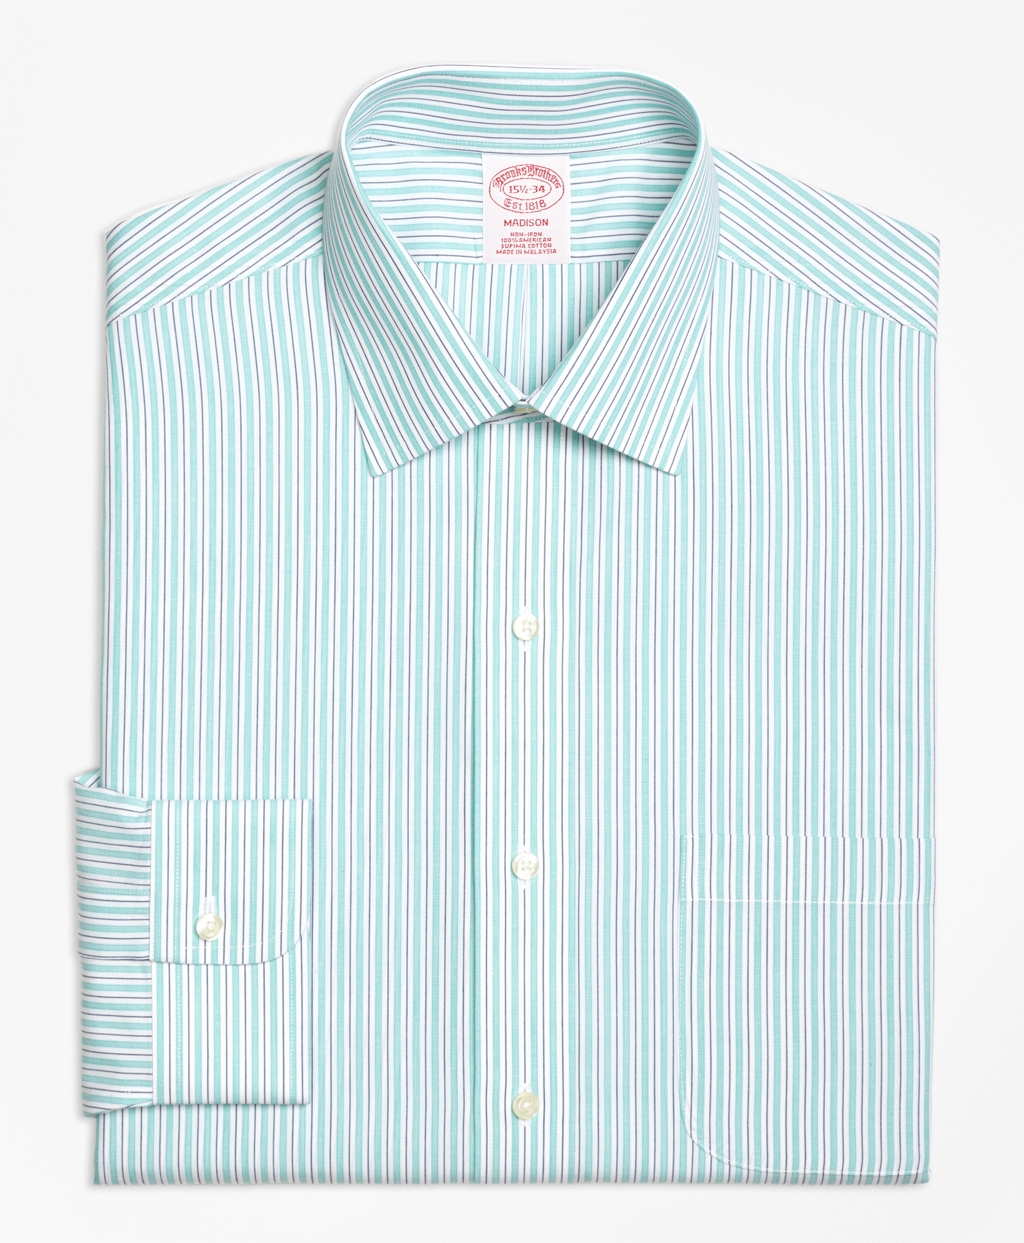 Brooks brothers non iron regent fit split stripe dress for Brooks brothers non iron shirts review